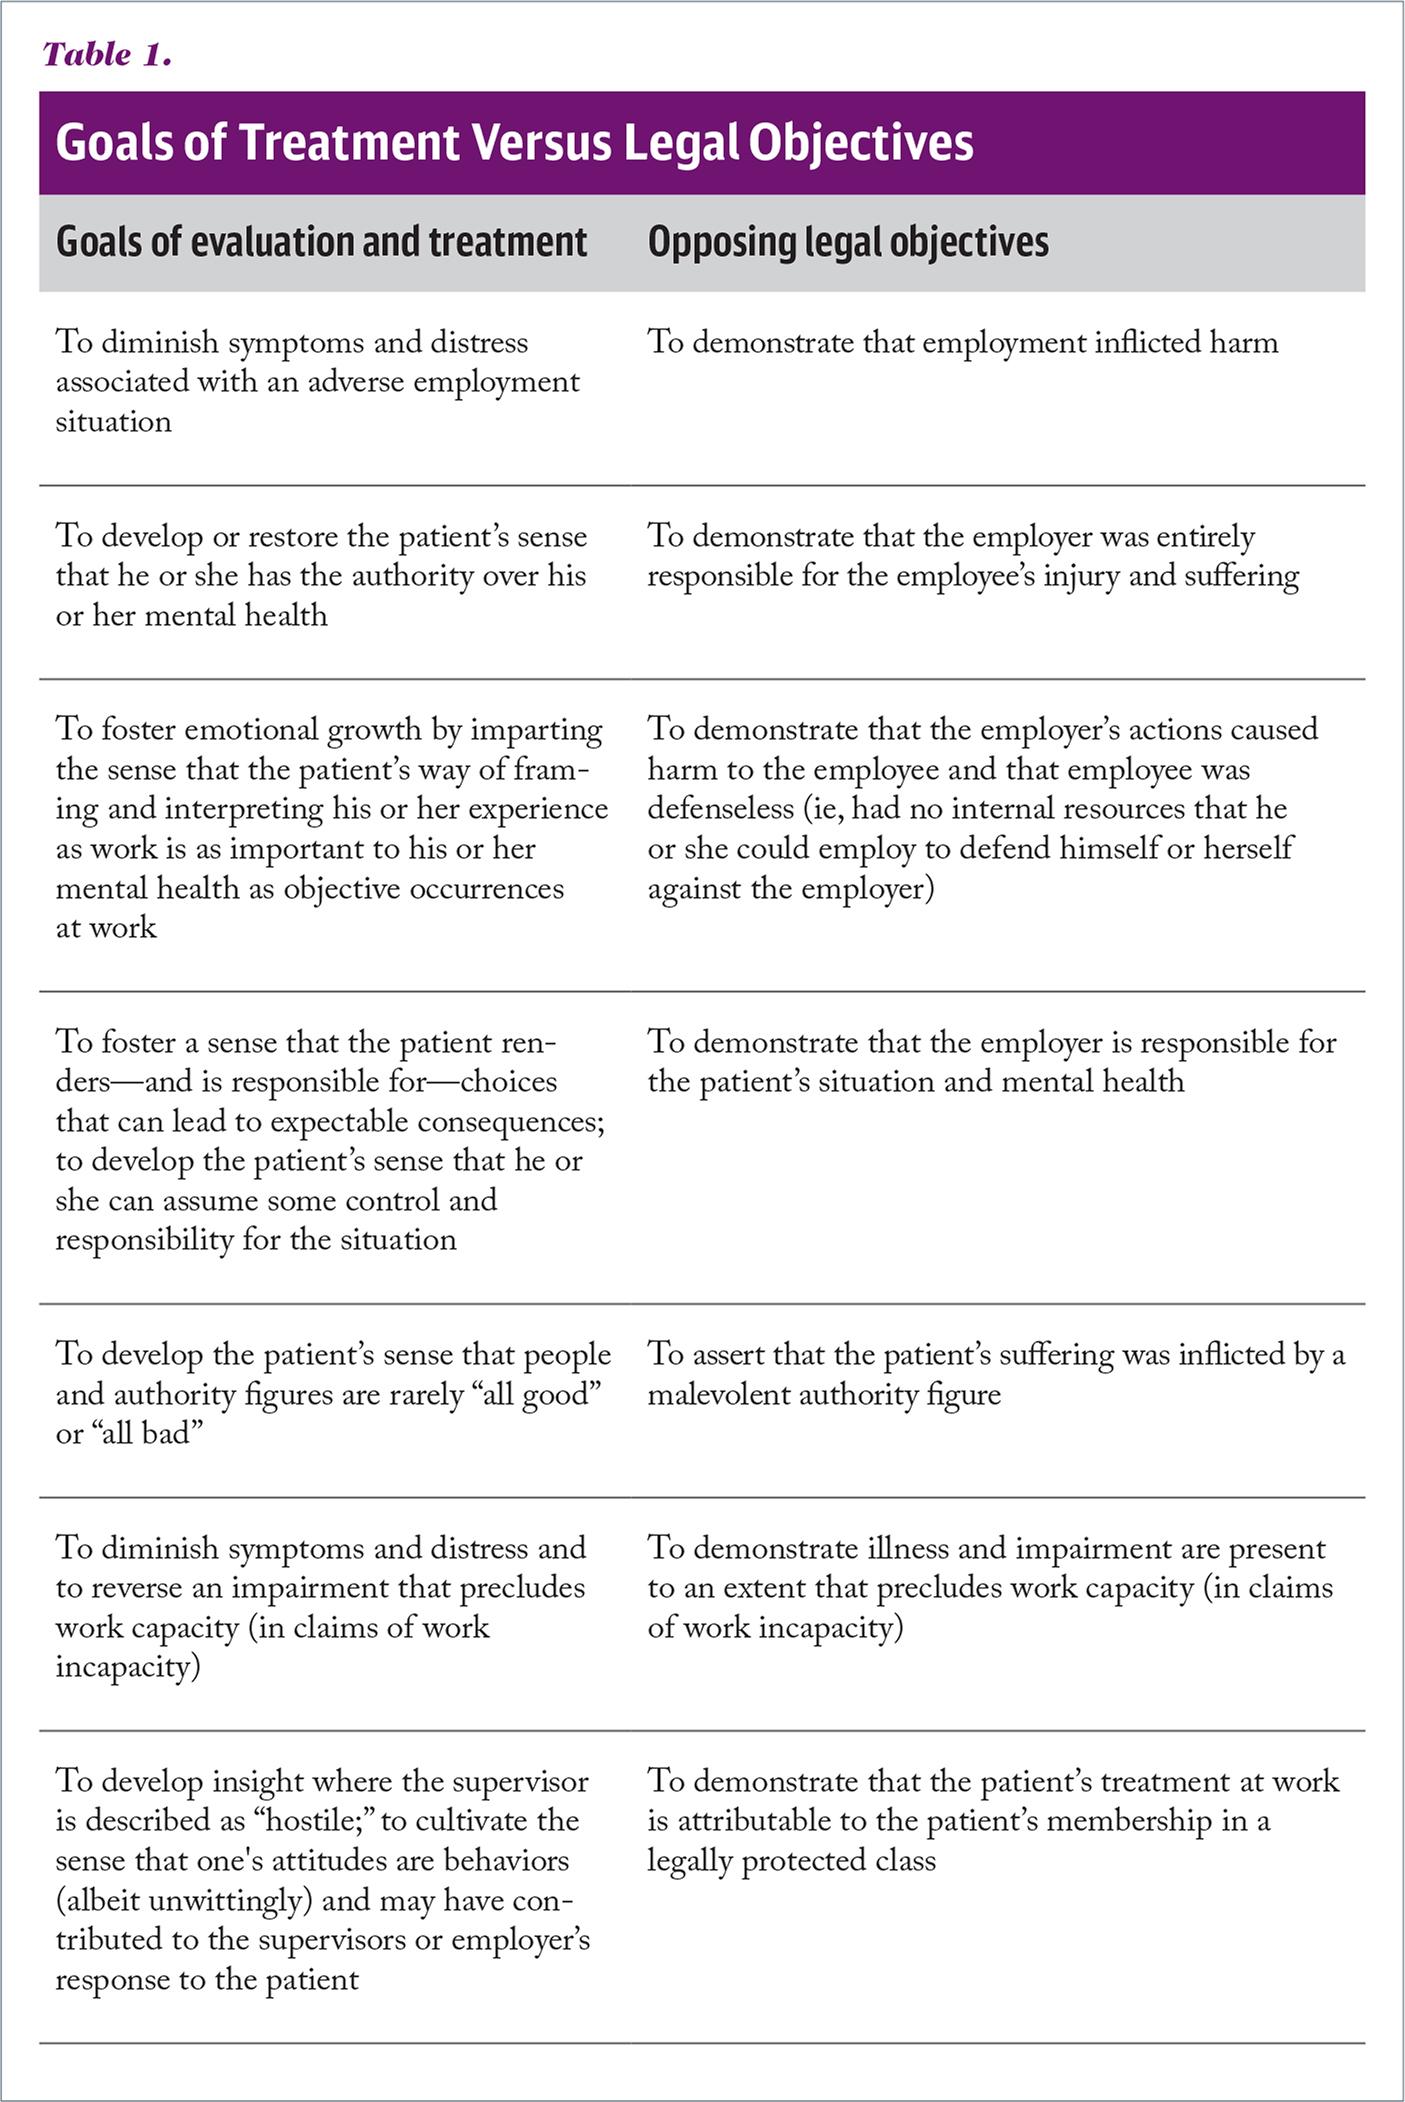 Goals of Treatment Versus Legal Objectives